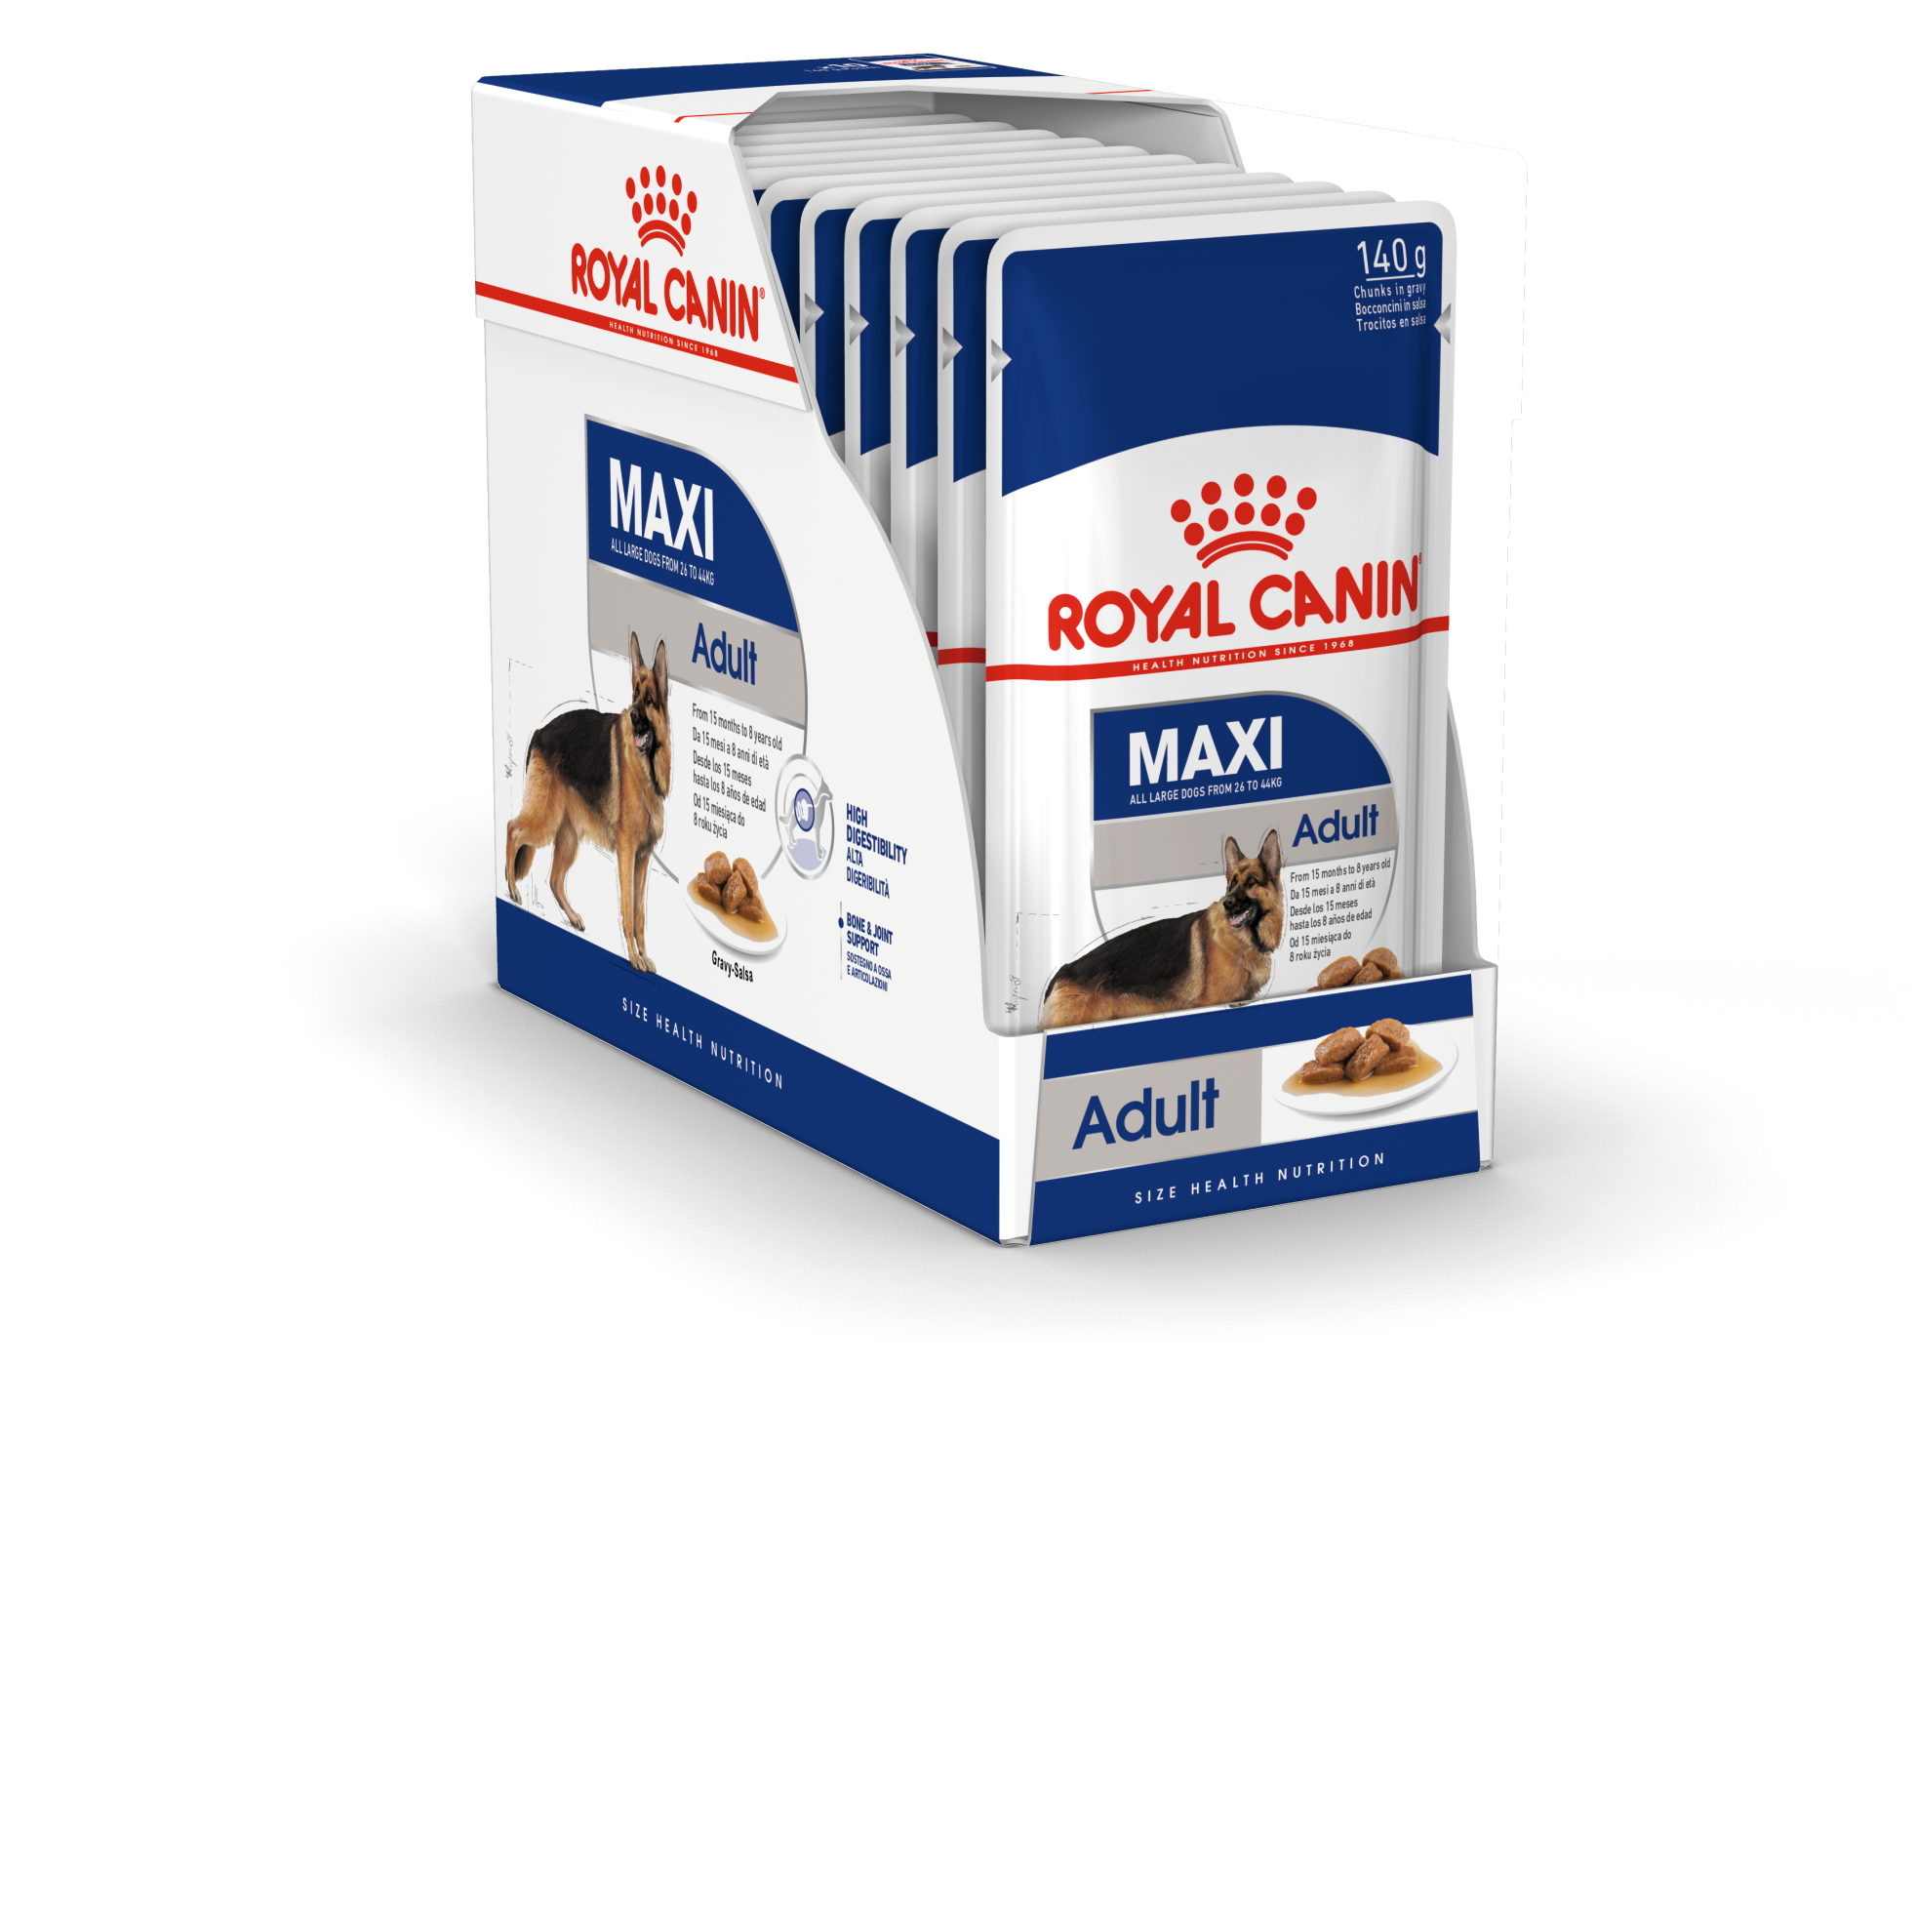 rc-maxi-adult-box-10-x-140g